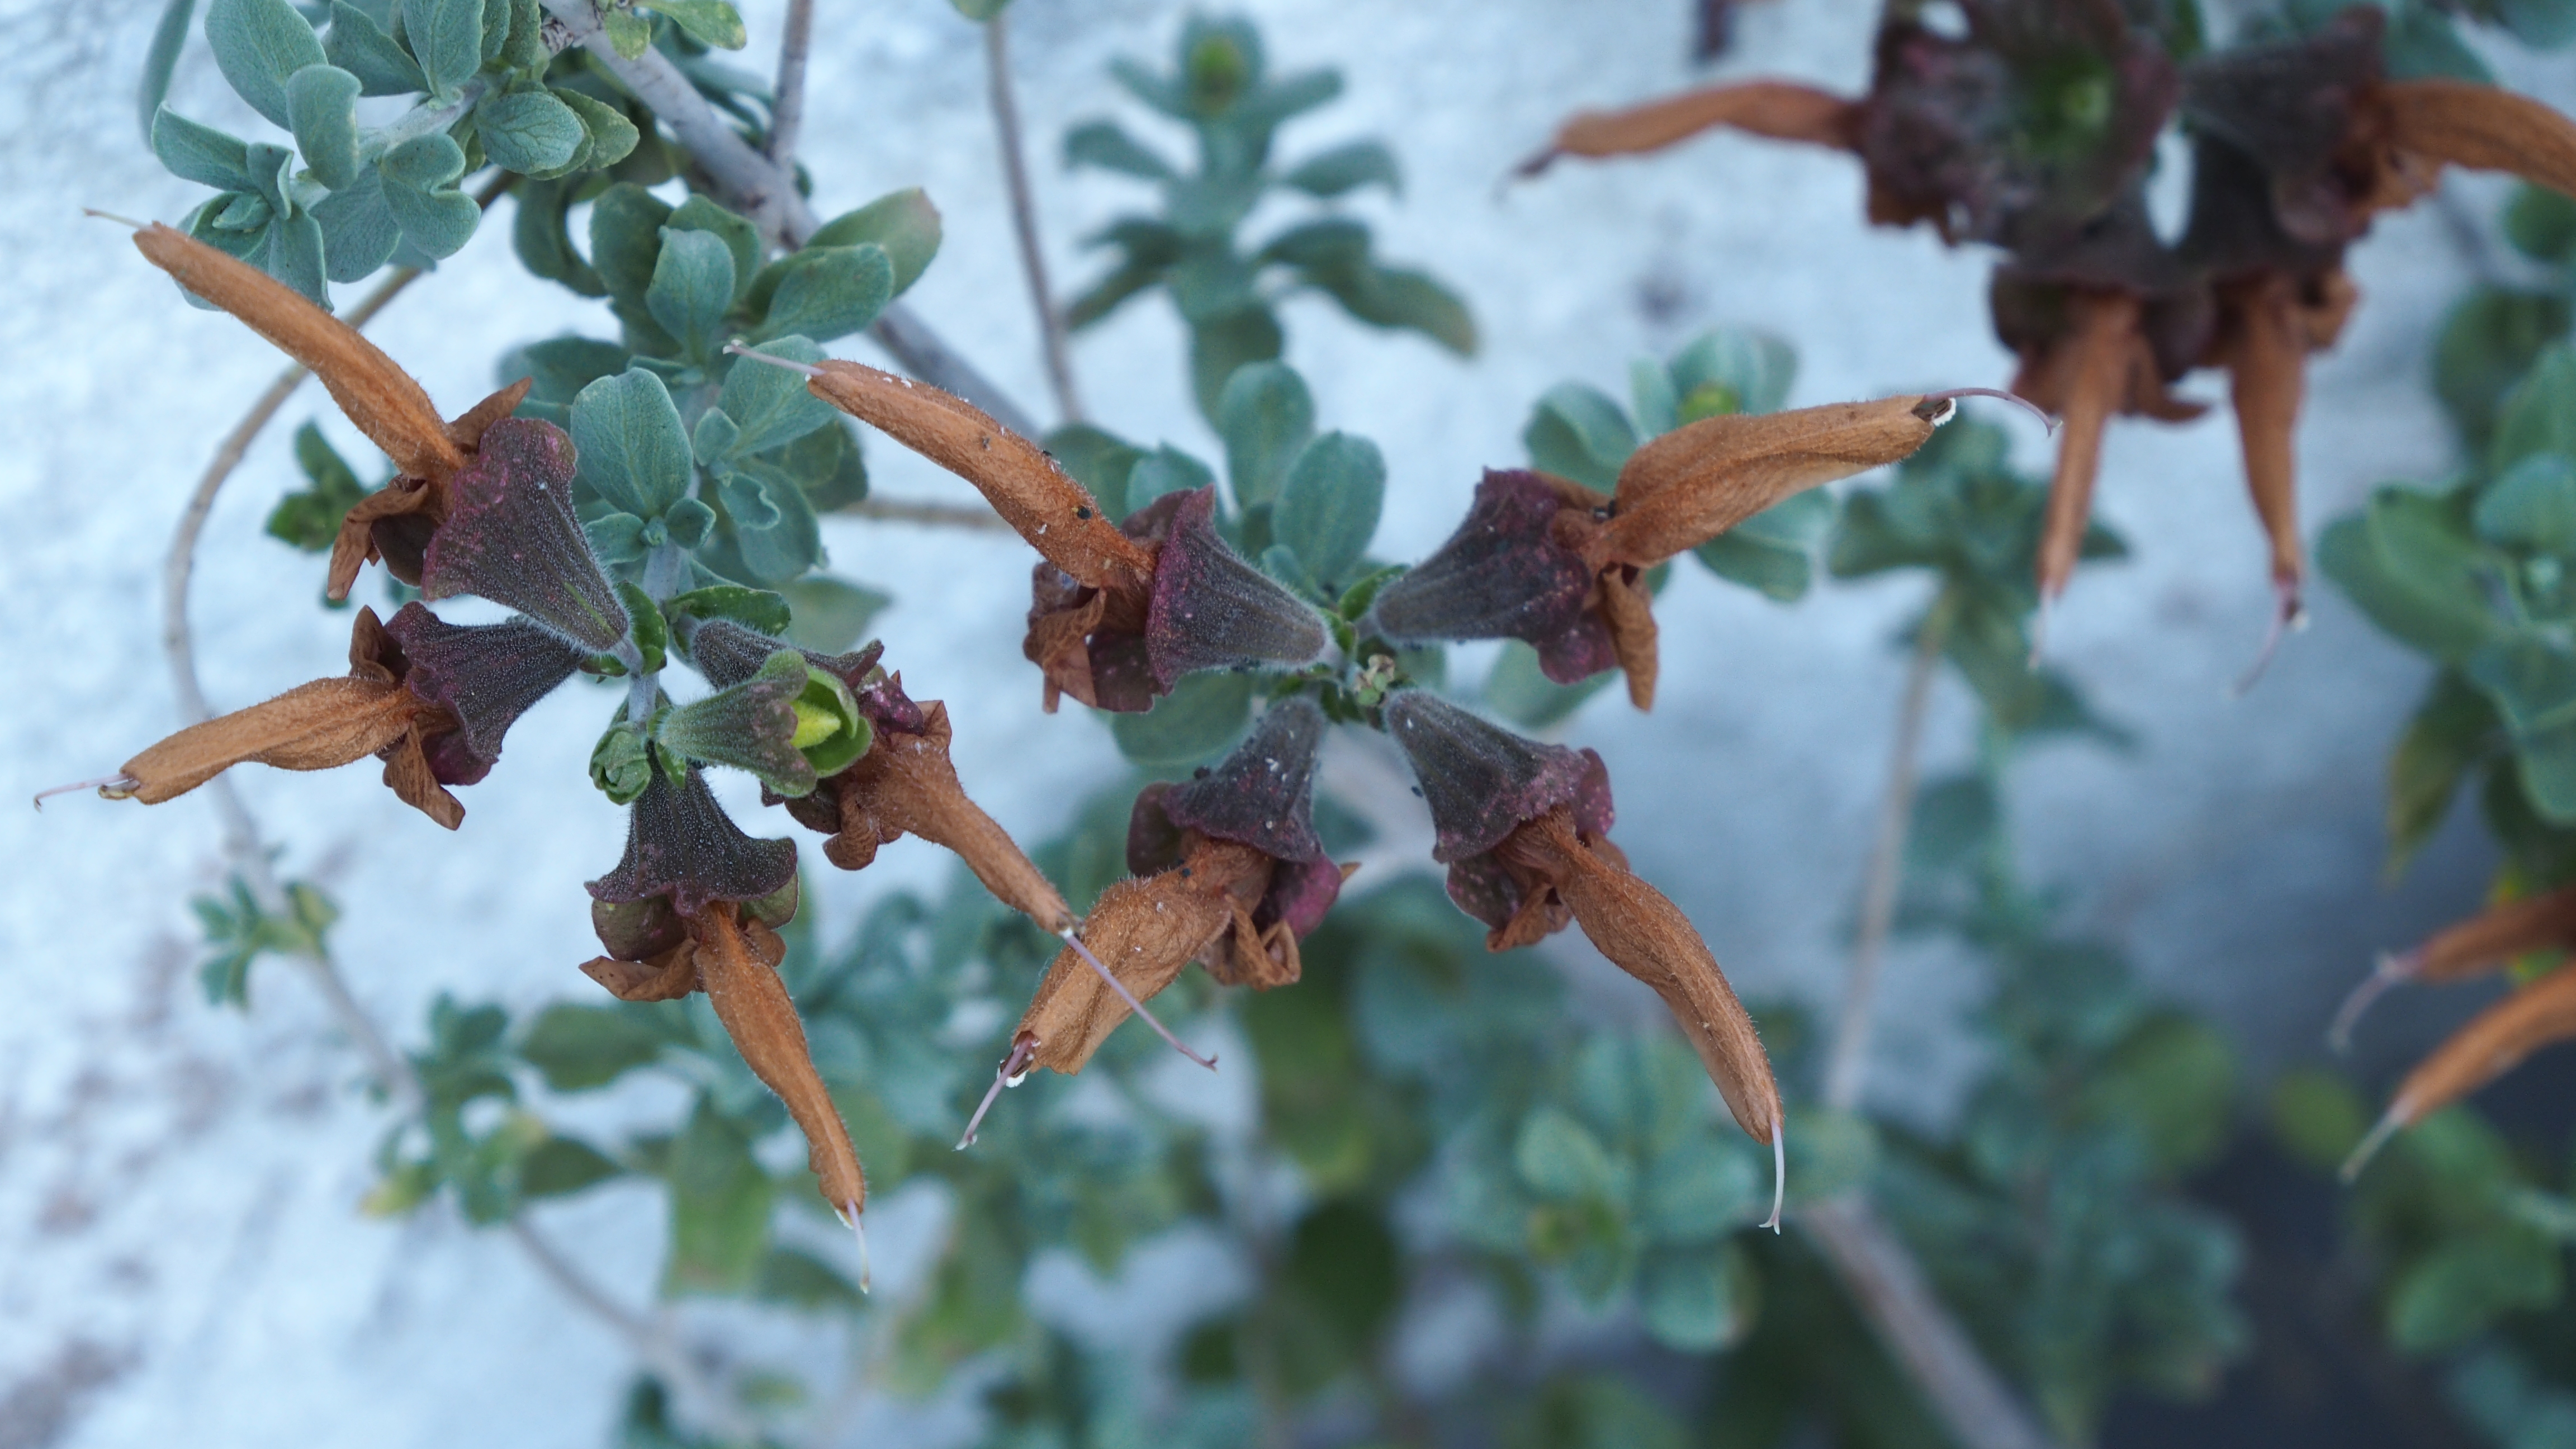 Salvia africana-lutea サルビア アフリカナ-ルテア